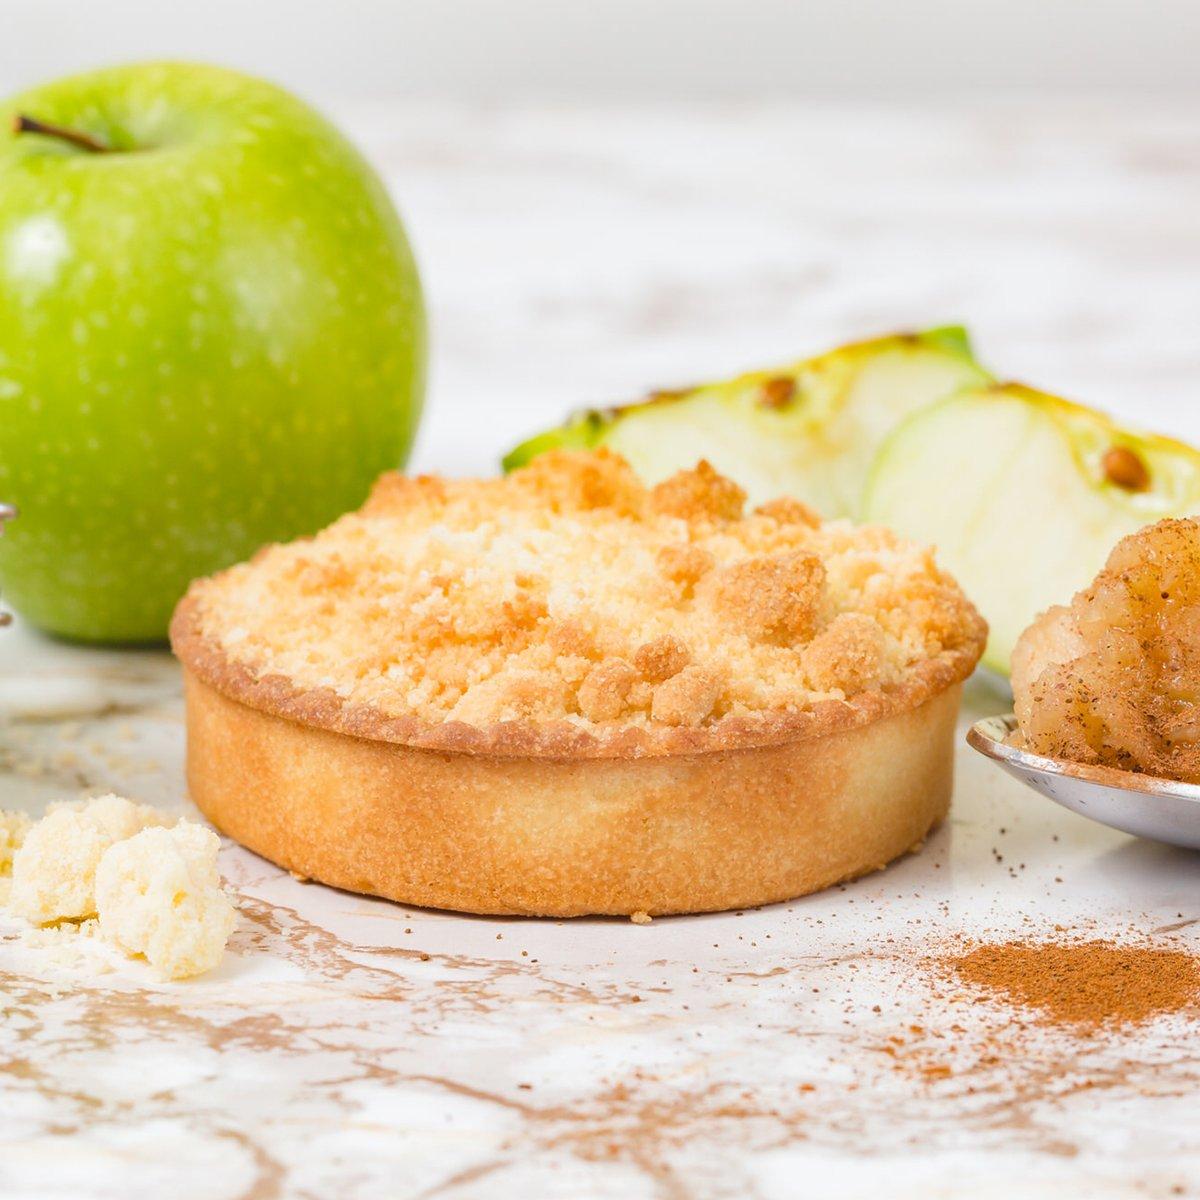 Apple and Cinnamon Crumble | Merci Beaucoup Cakes